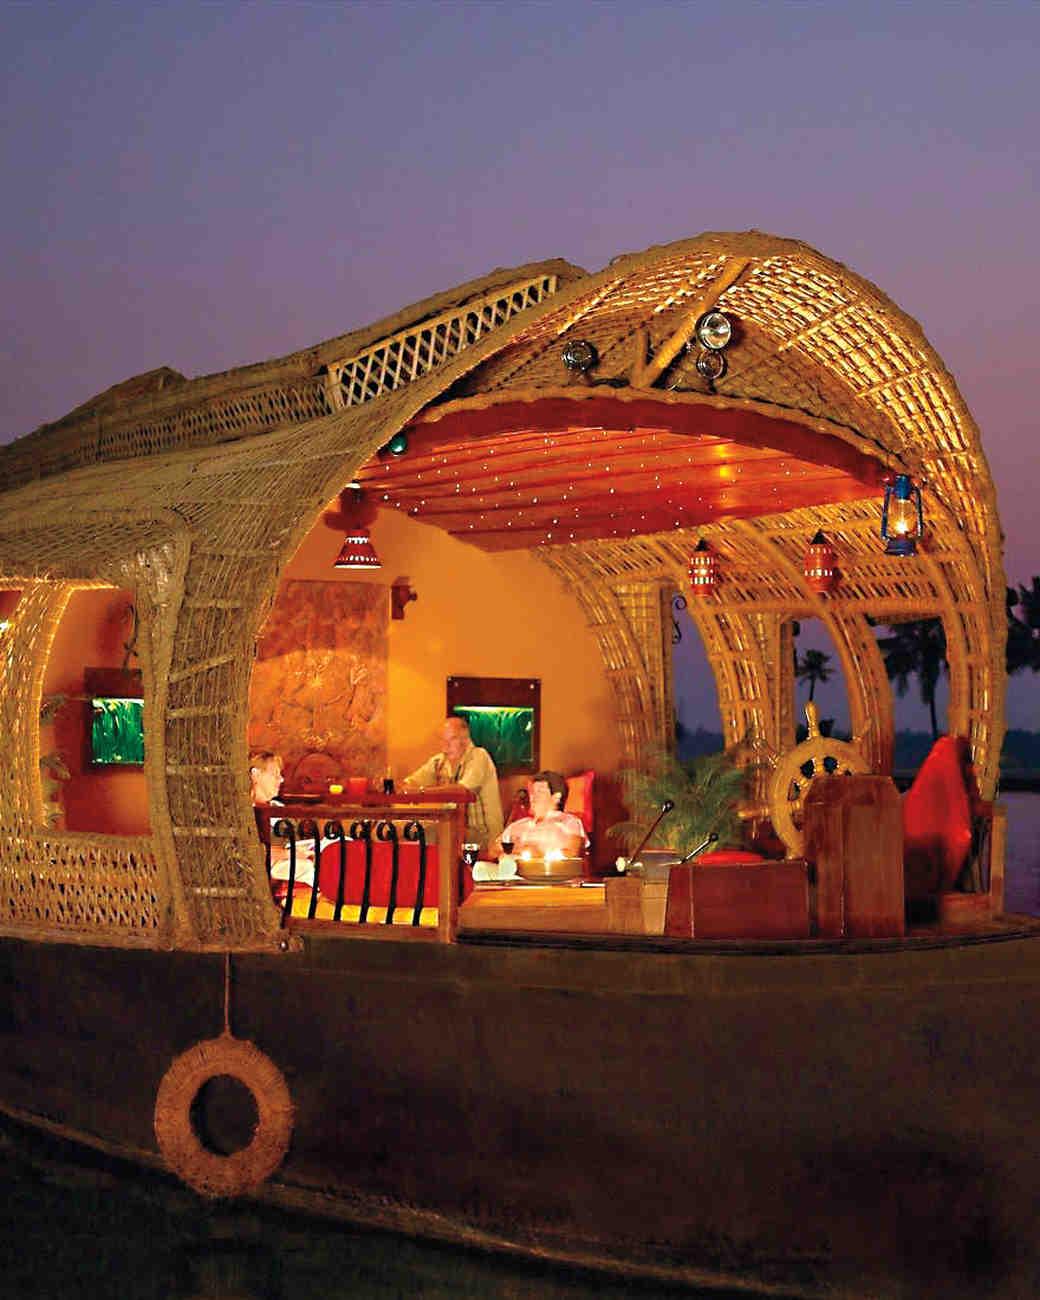 houseboat-india-raxa-collective-mws110053.jpg